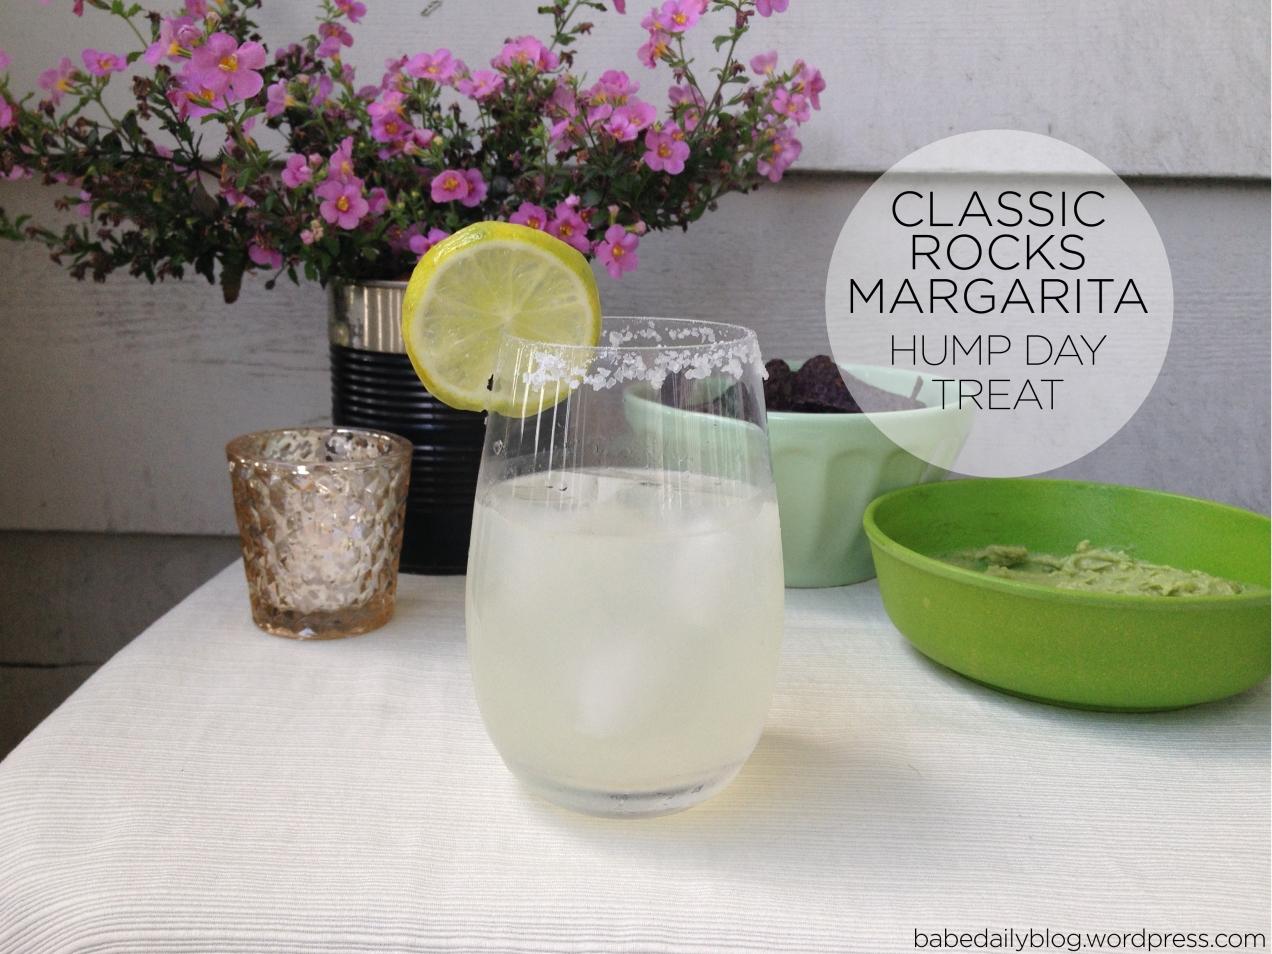 Classic Rocks Margarita